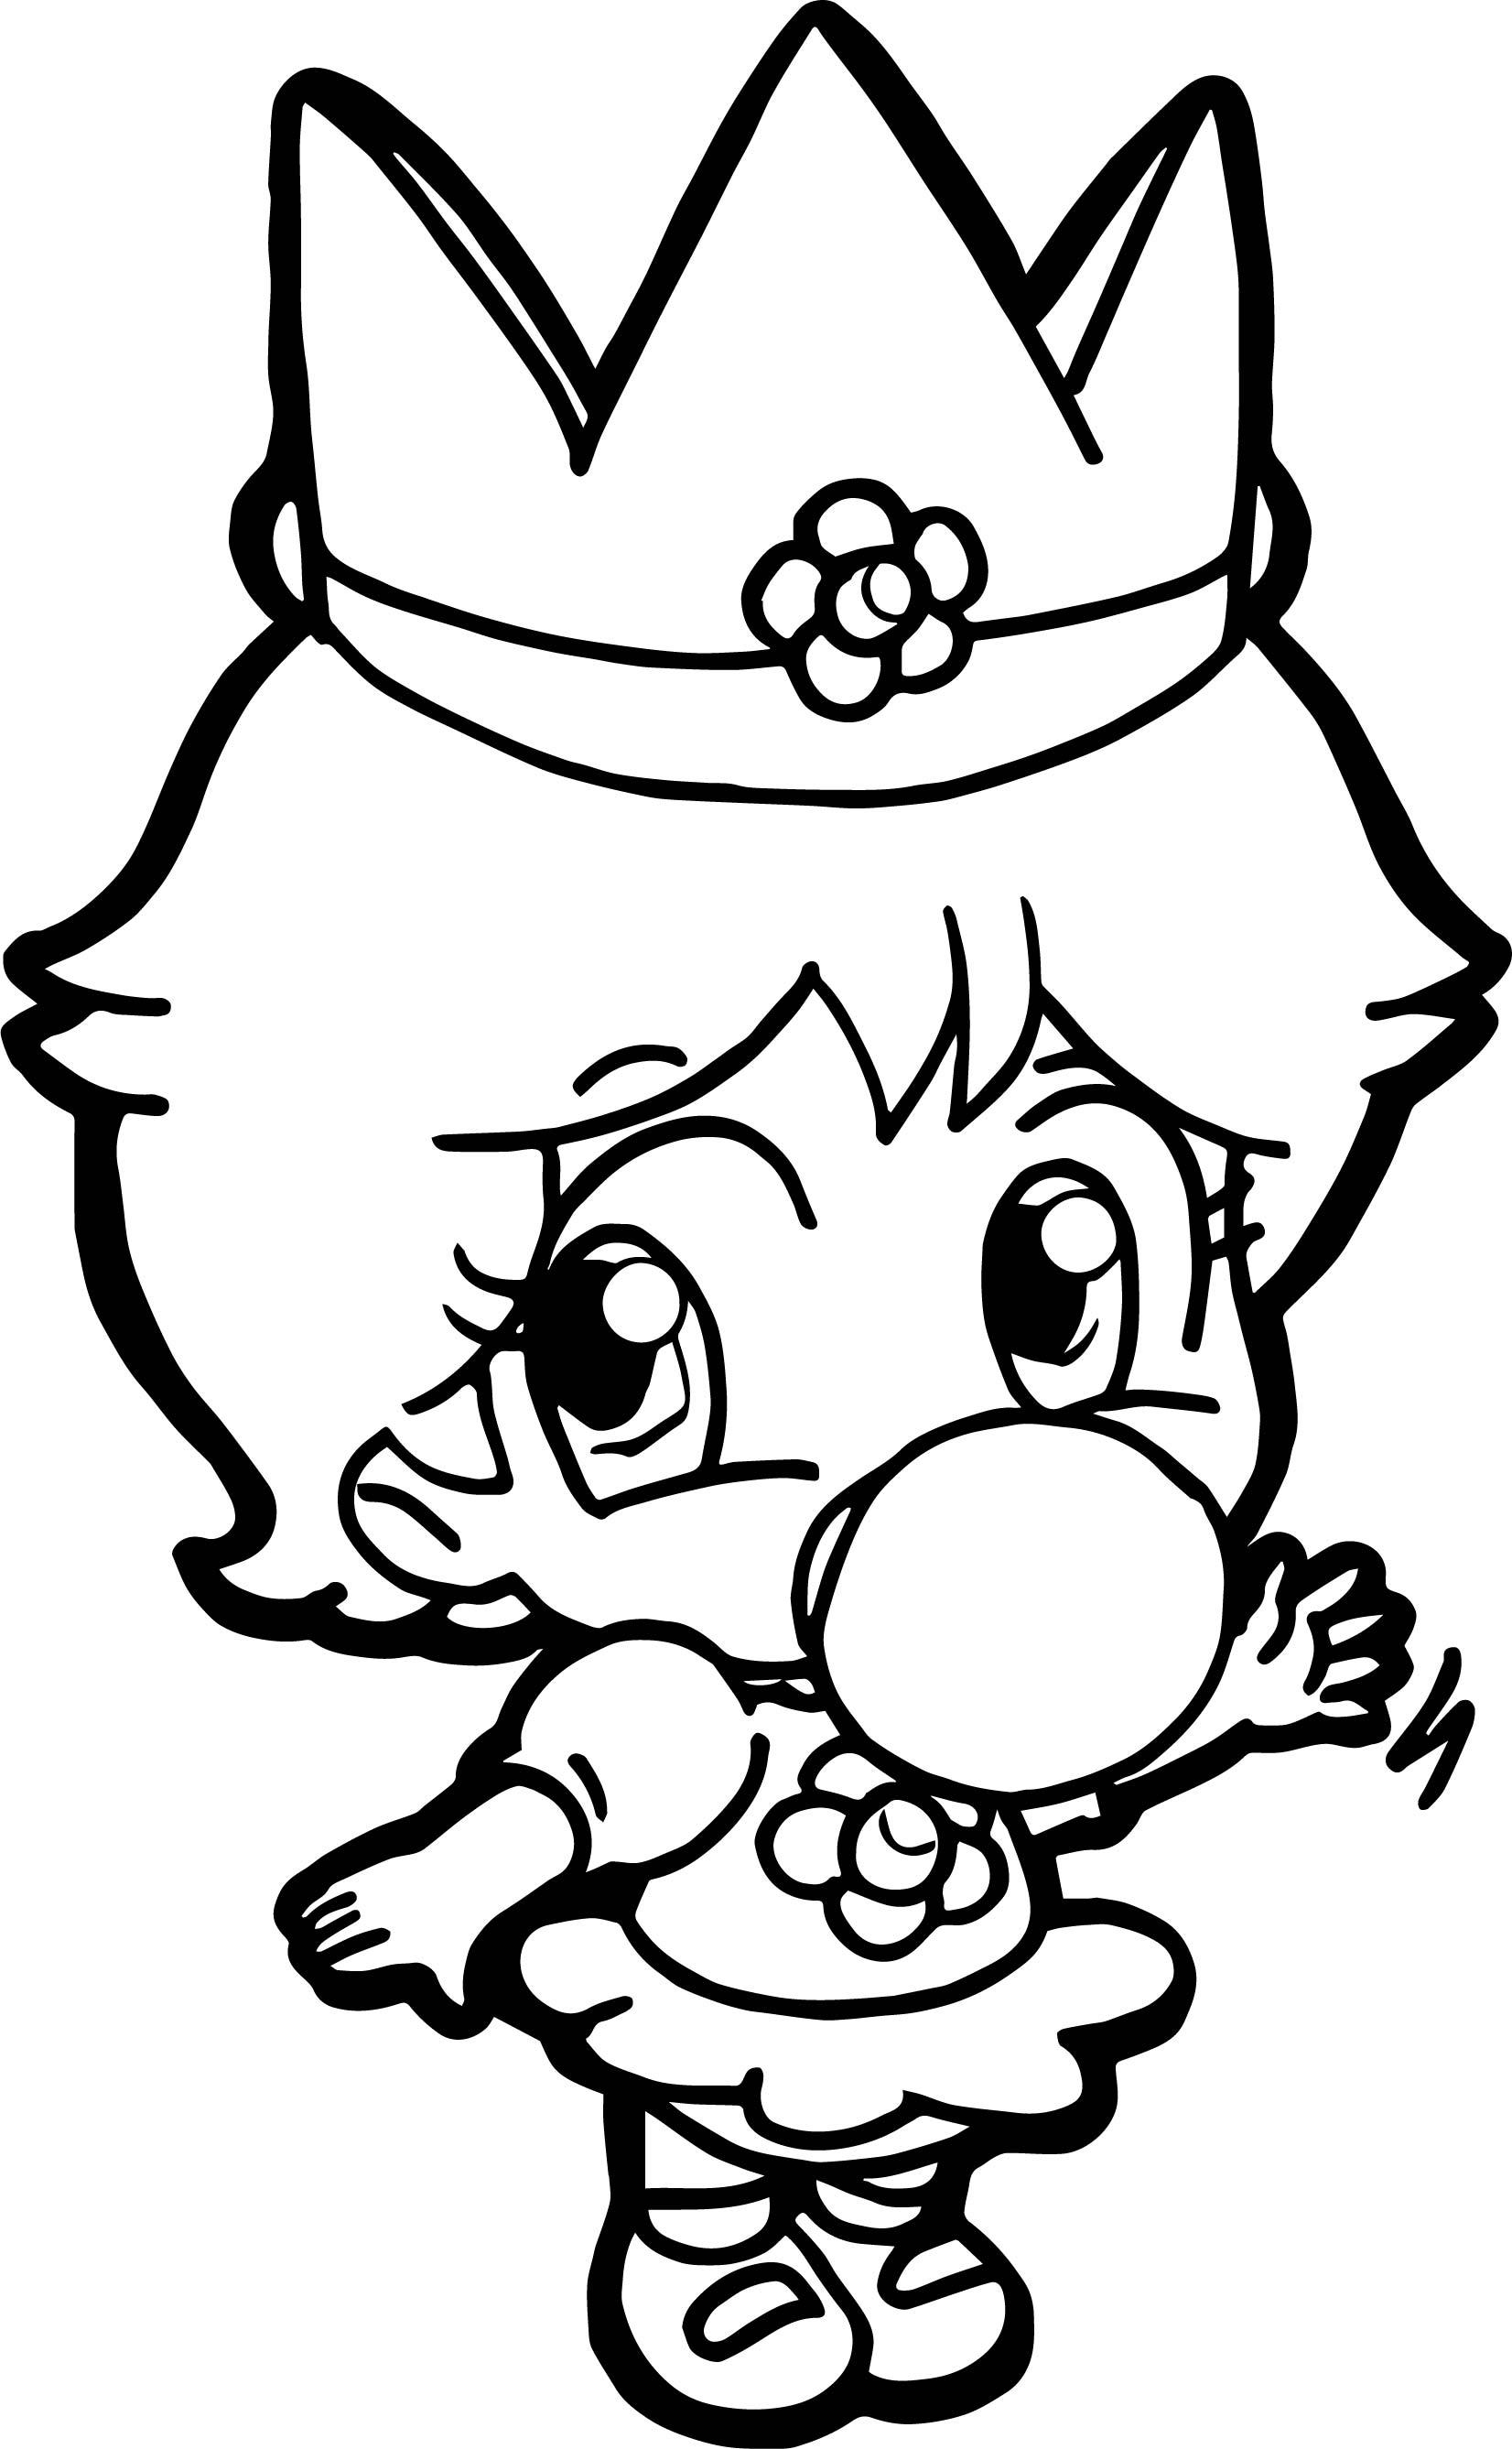 1652x2675 Rosalina Mario Coloring Pages New Baby Bowser Coloring Page